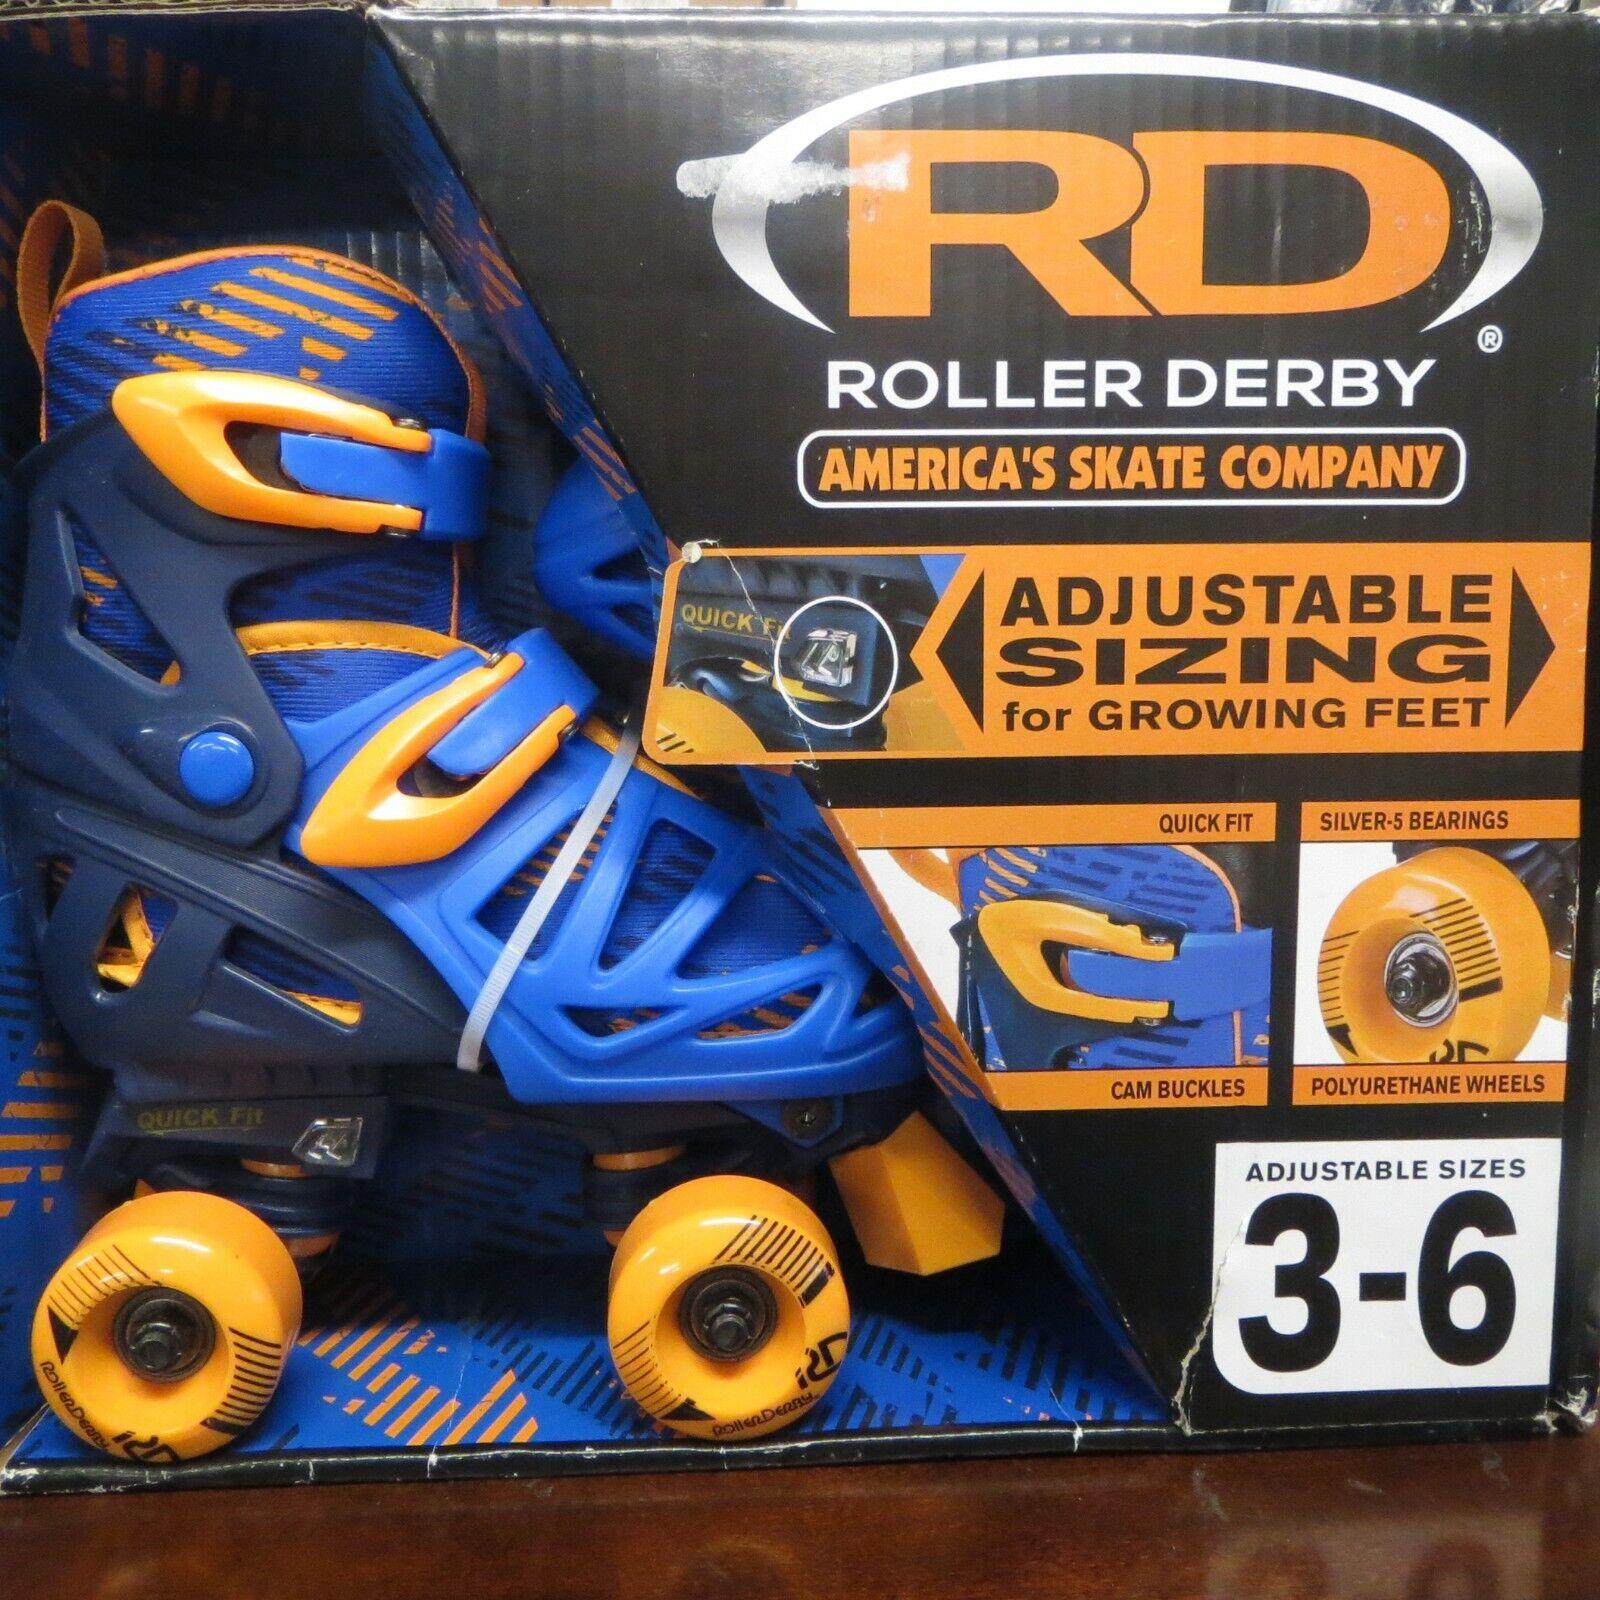 Roller Derby Quad S s adjustable size 3-6 bluee  orange NEW  the latest